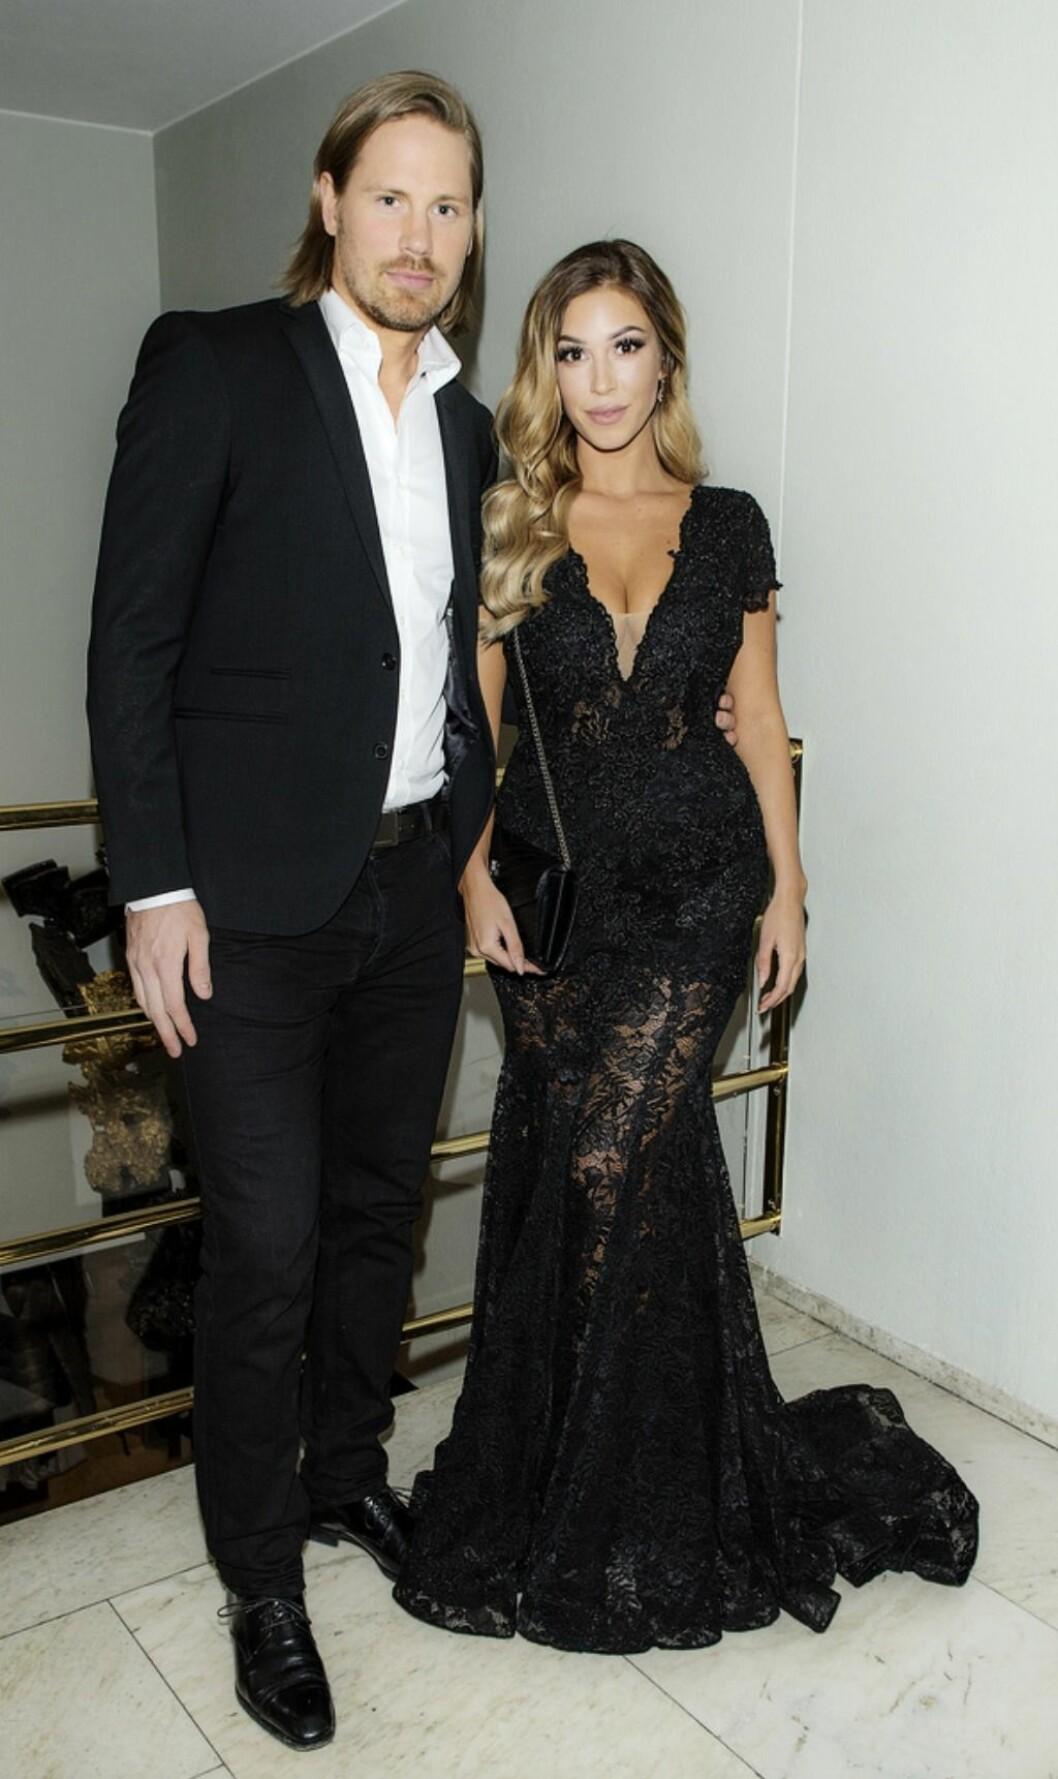 Stefan Warg och Josephine Qvist på gala